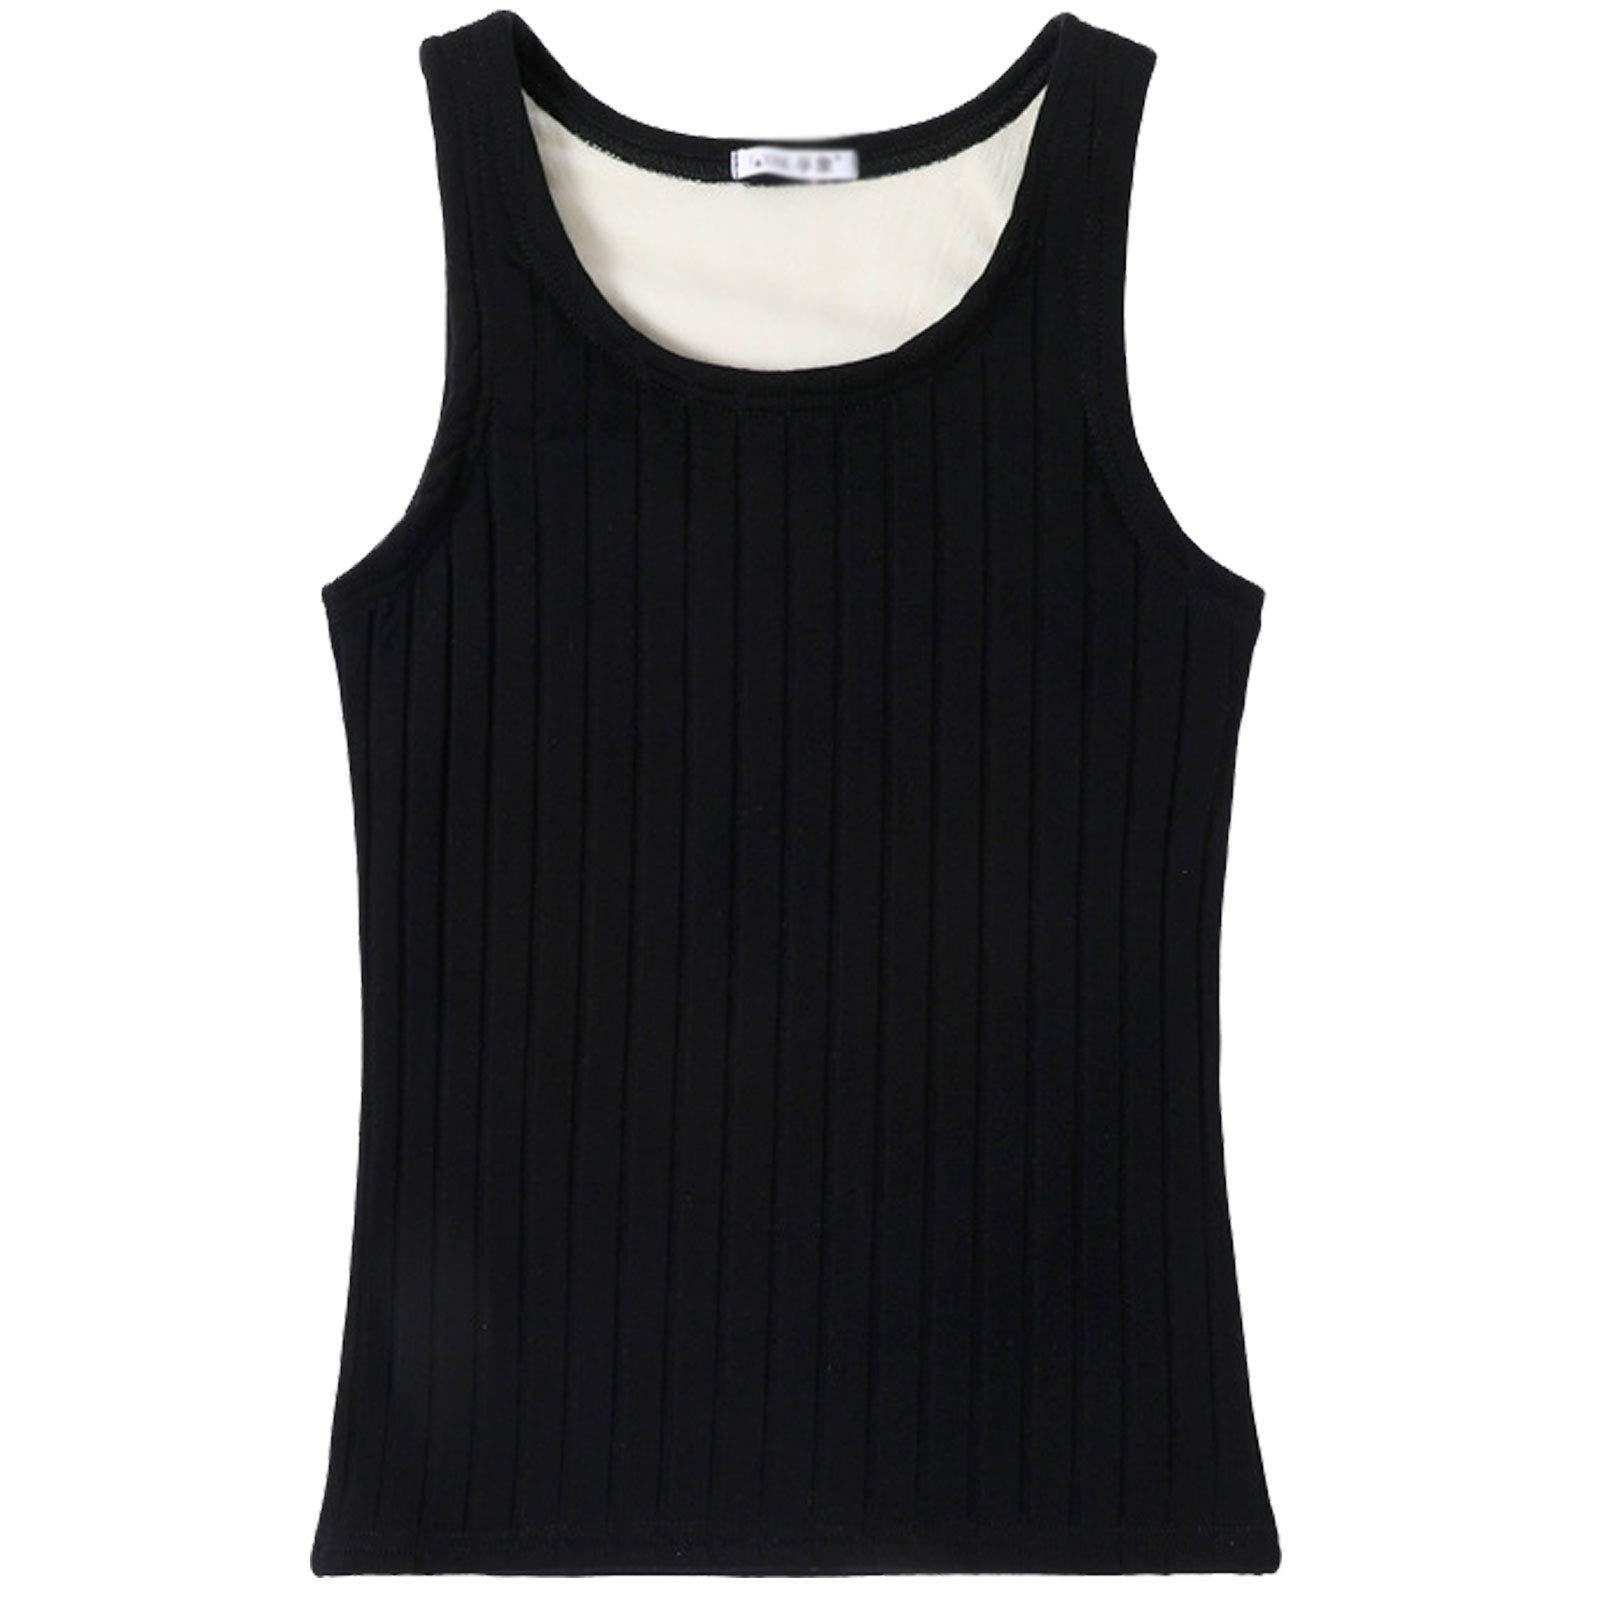 Flygo Women's Fleece Lined Tank Top Thermal Skinny Underwear Tops